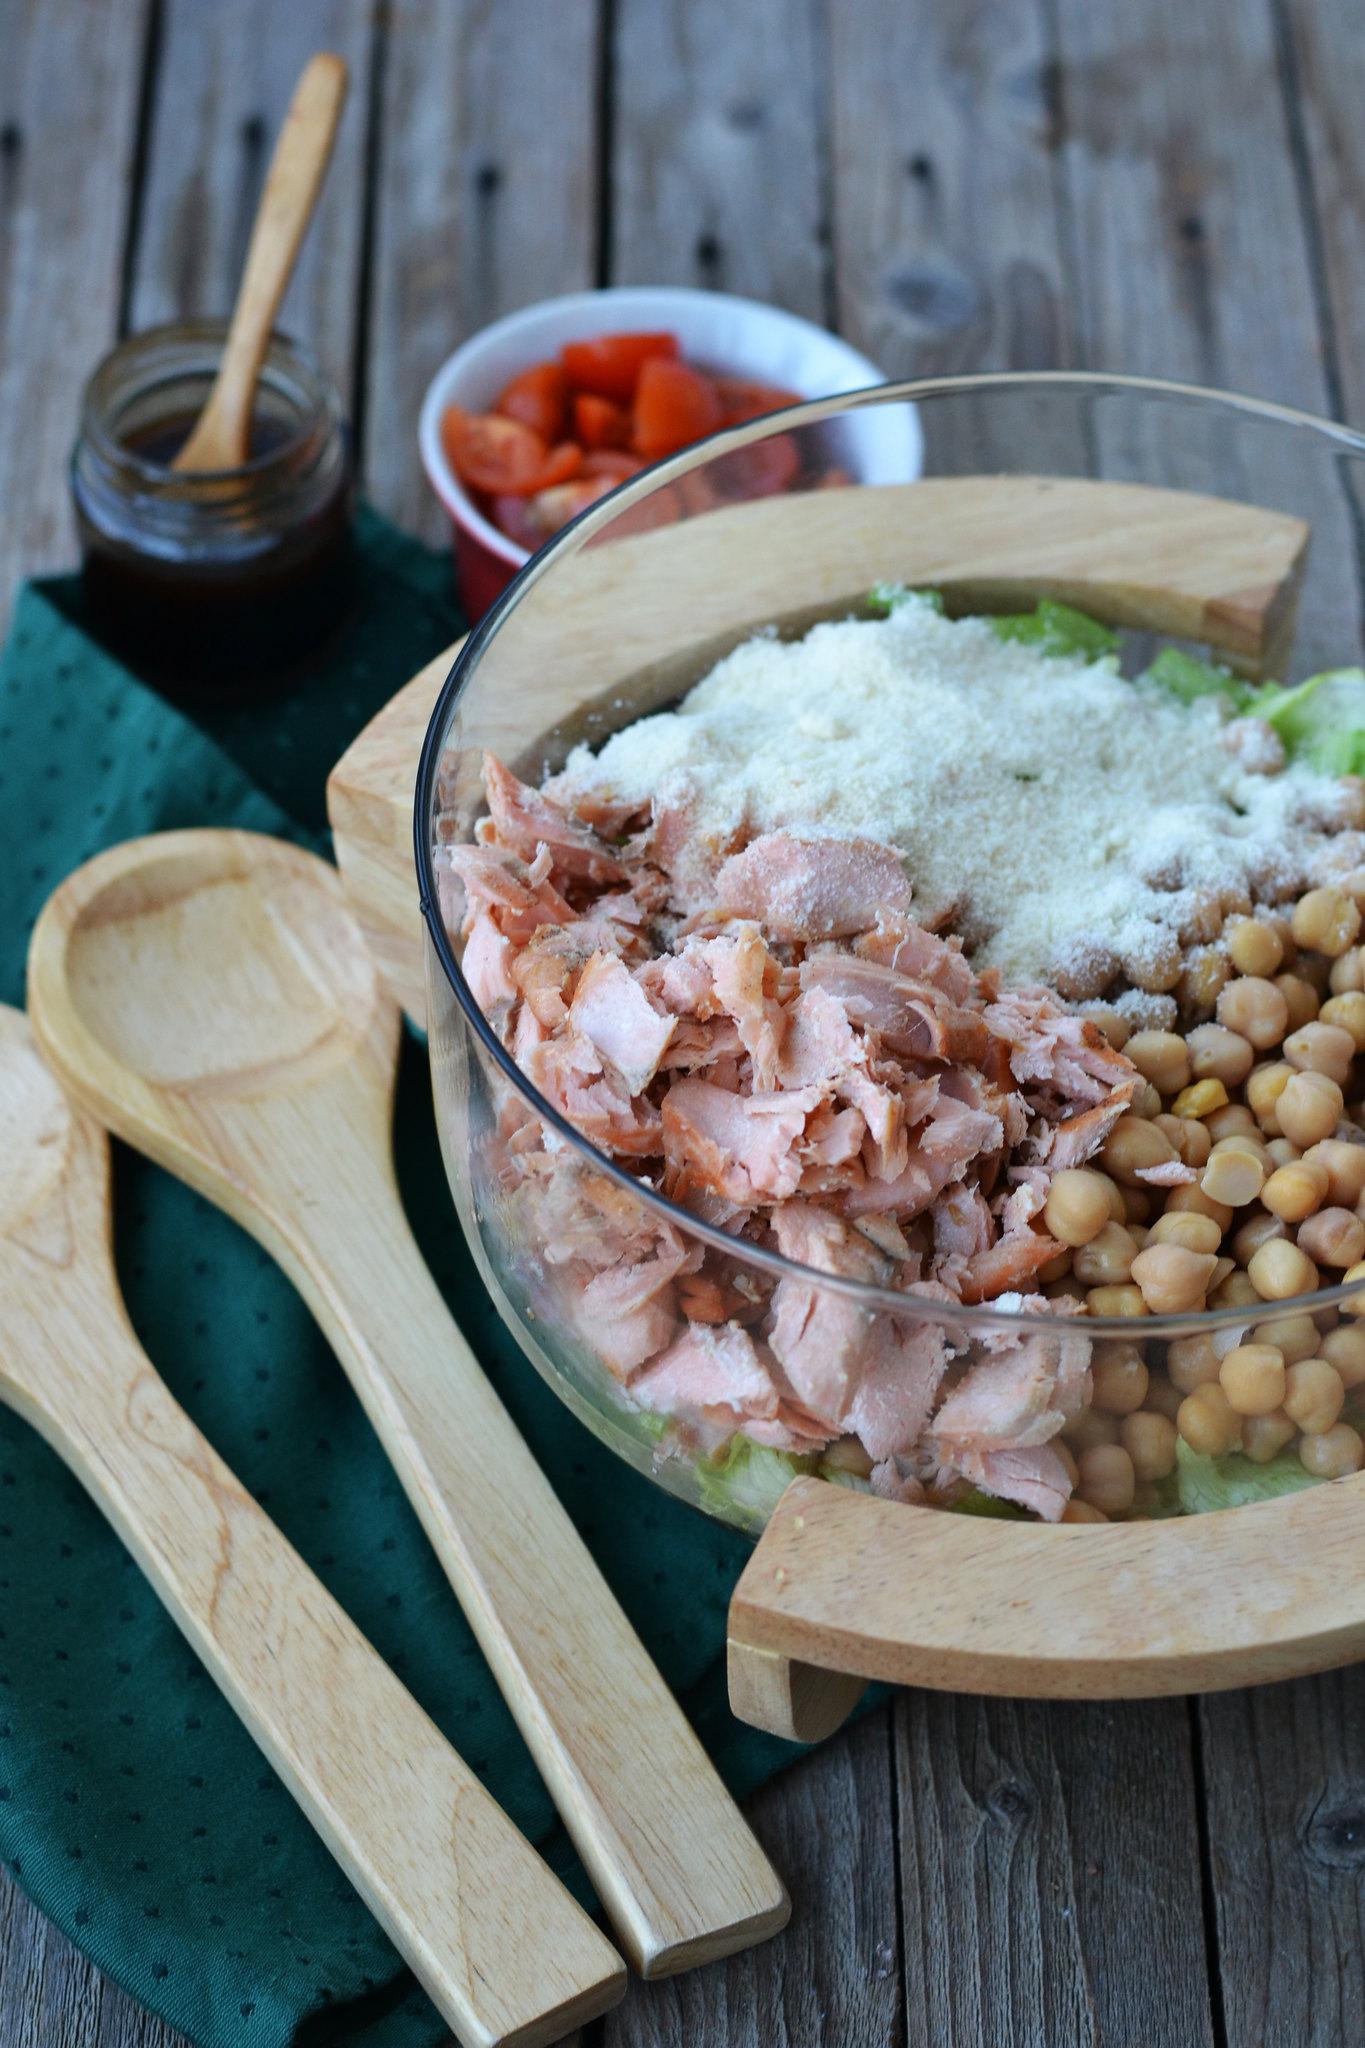 amestecarea ingredientelor salata de naut si somon